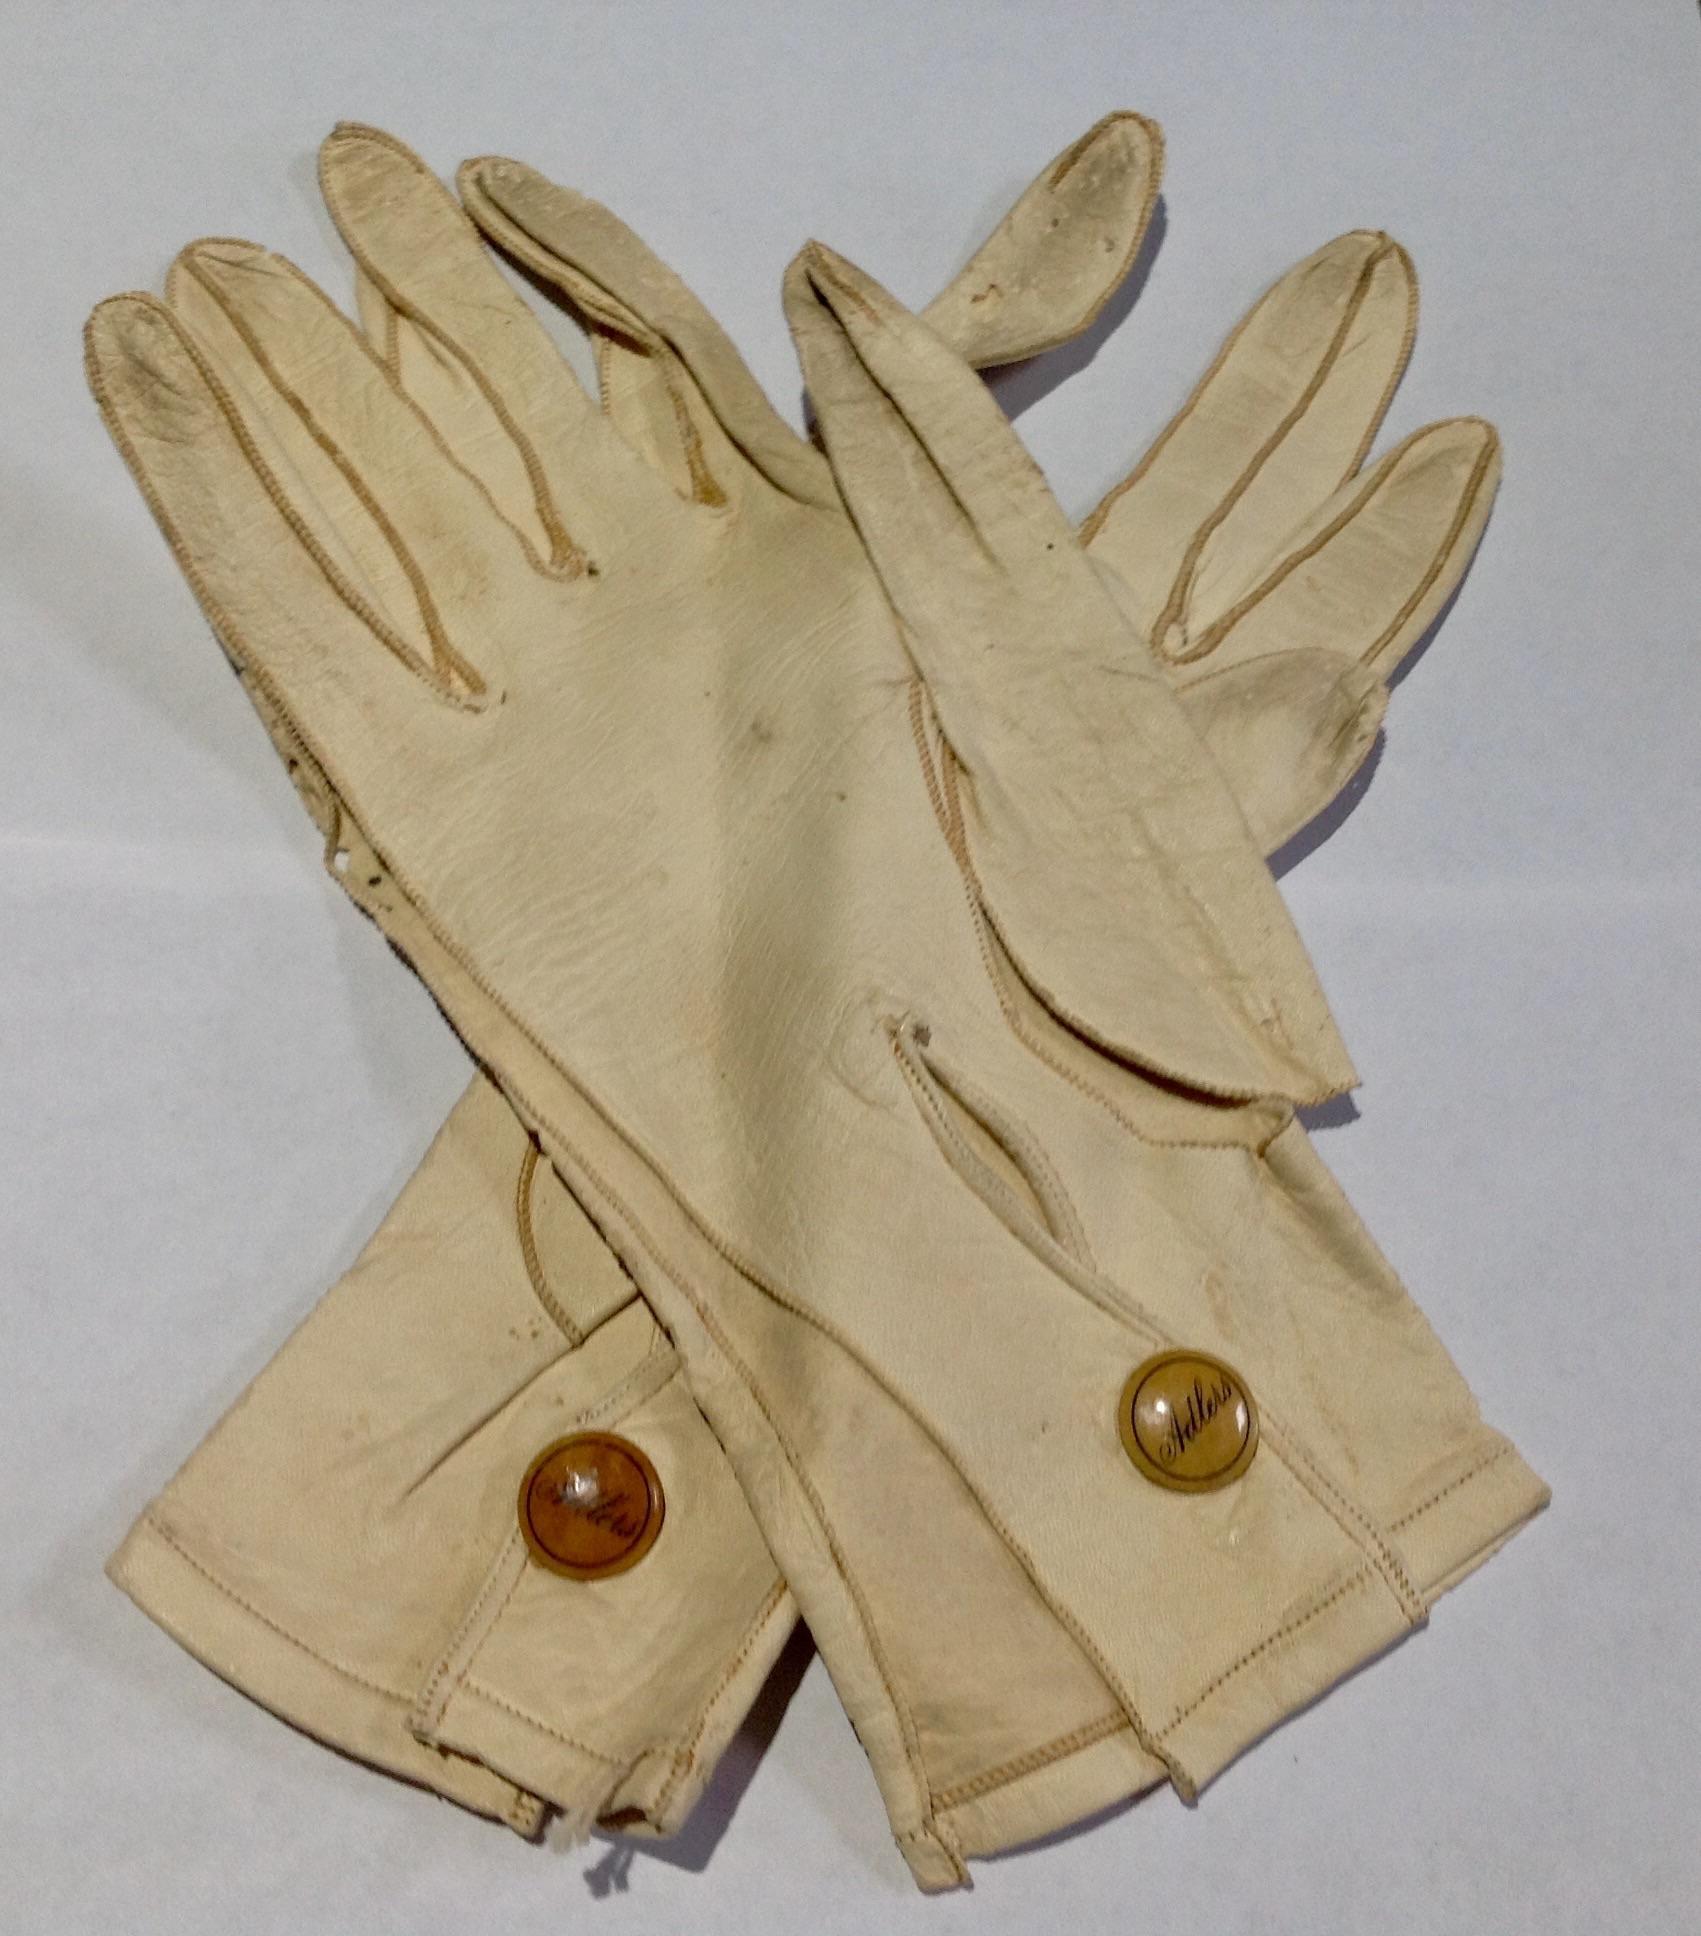 vintage new orleans adlers jewelry store gloves from bestkeptsecrets on ruby lane. Black Bedroom Furniture Sets. Home Design Ideas